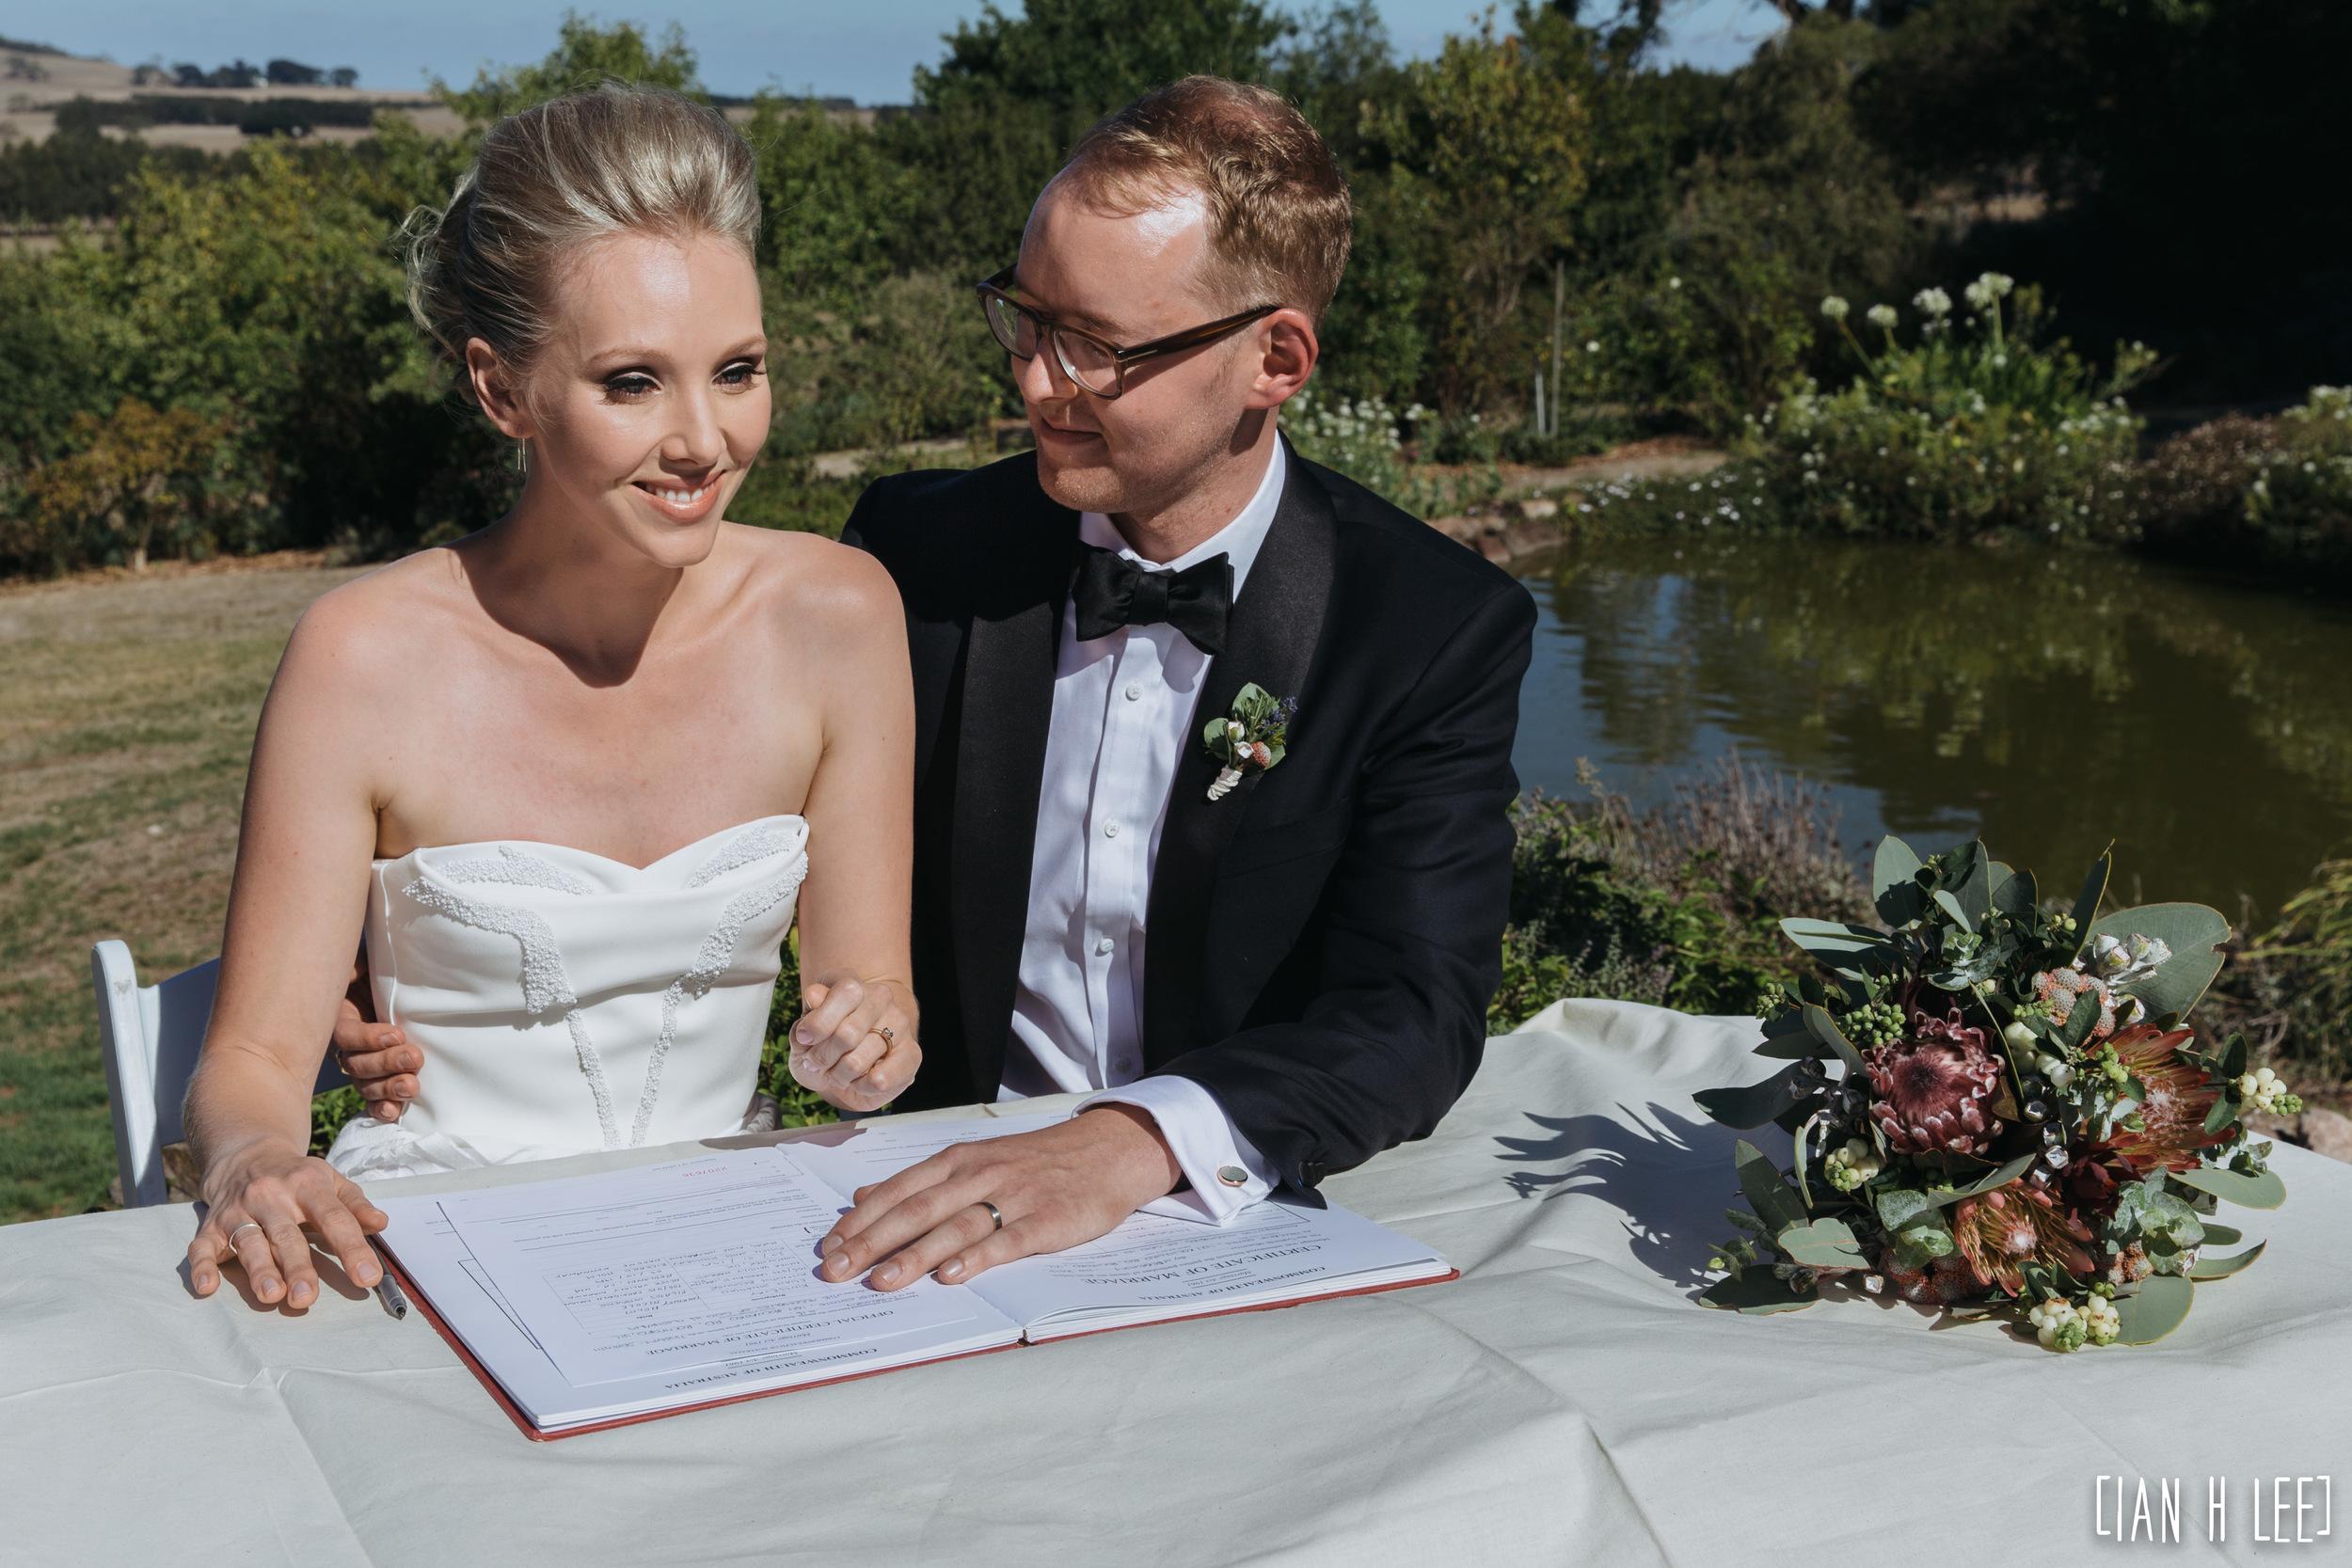 [Ian H Lee] Photography || Weddings - Melbourne || Ewan And Courtney -9794.jpg